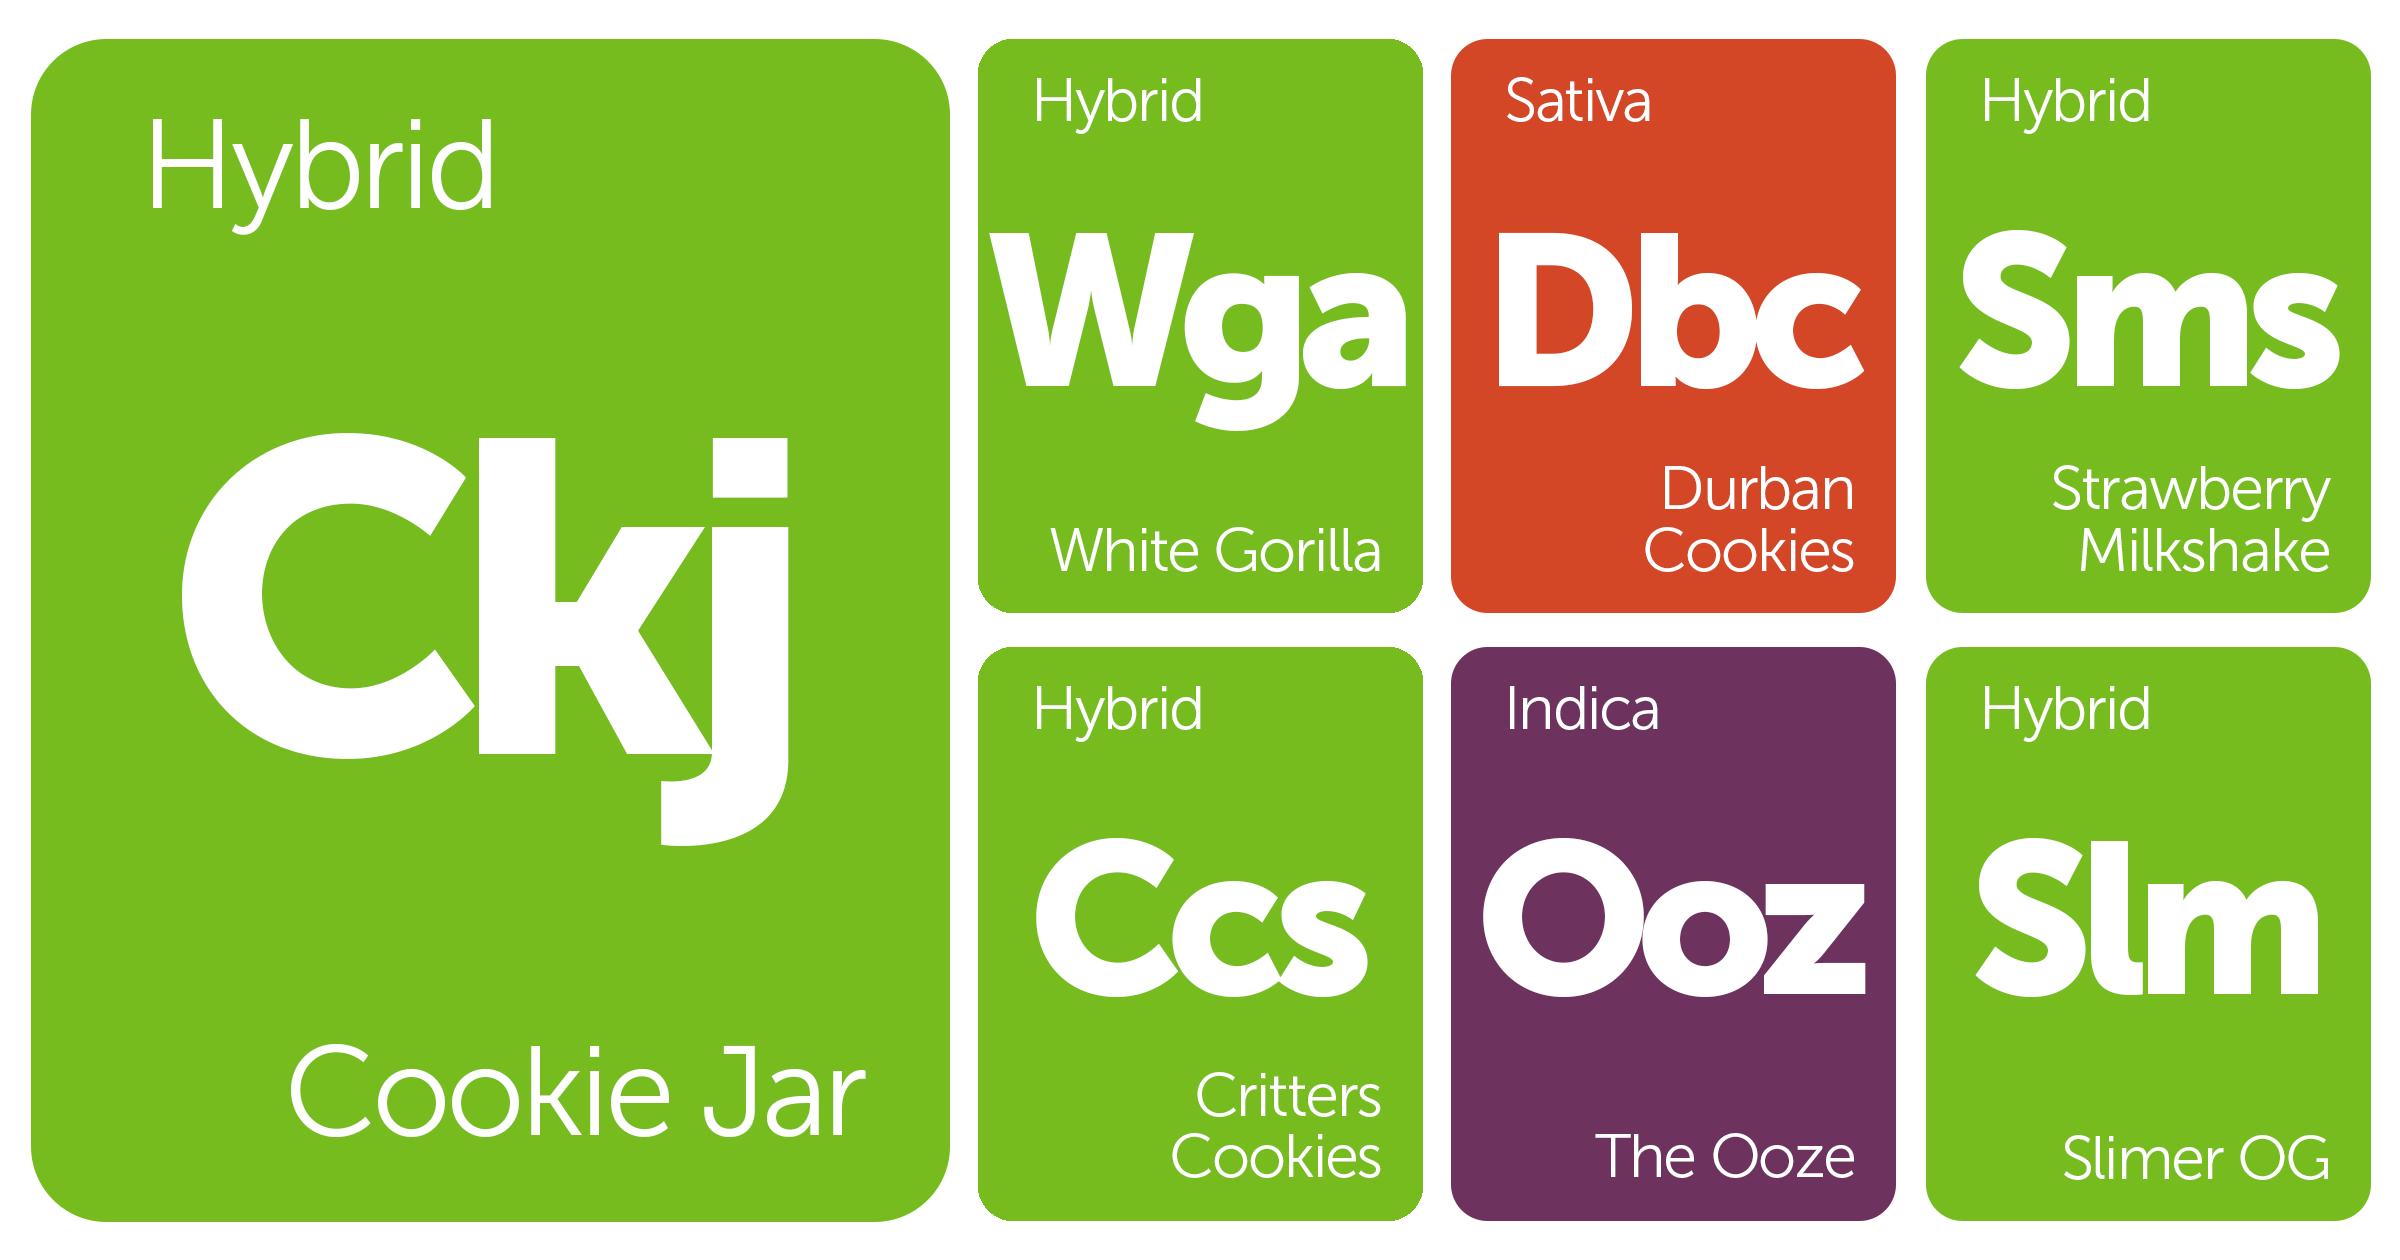 New Strains Alert: Durban Cookies, Cookie Jar, The Ooze, Strawberry Milkshake, and More